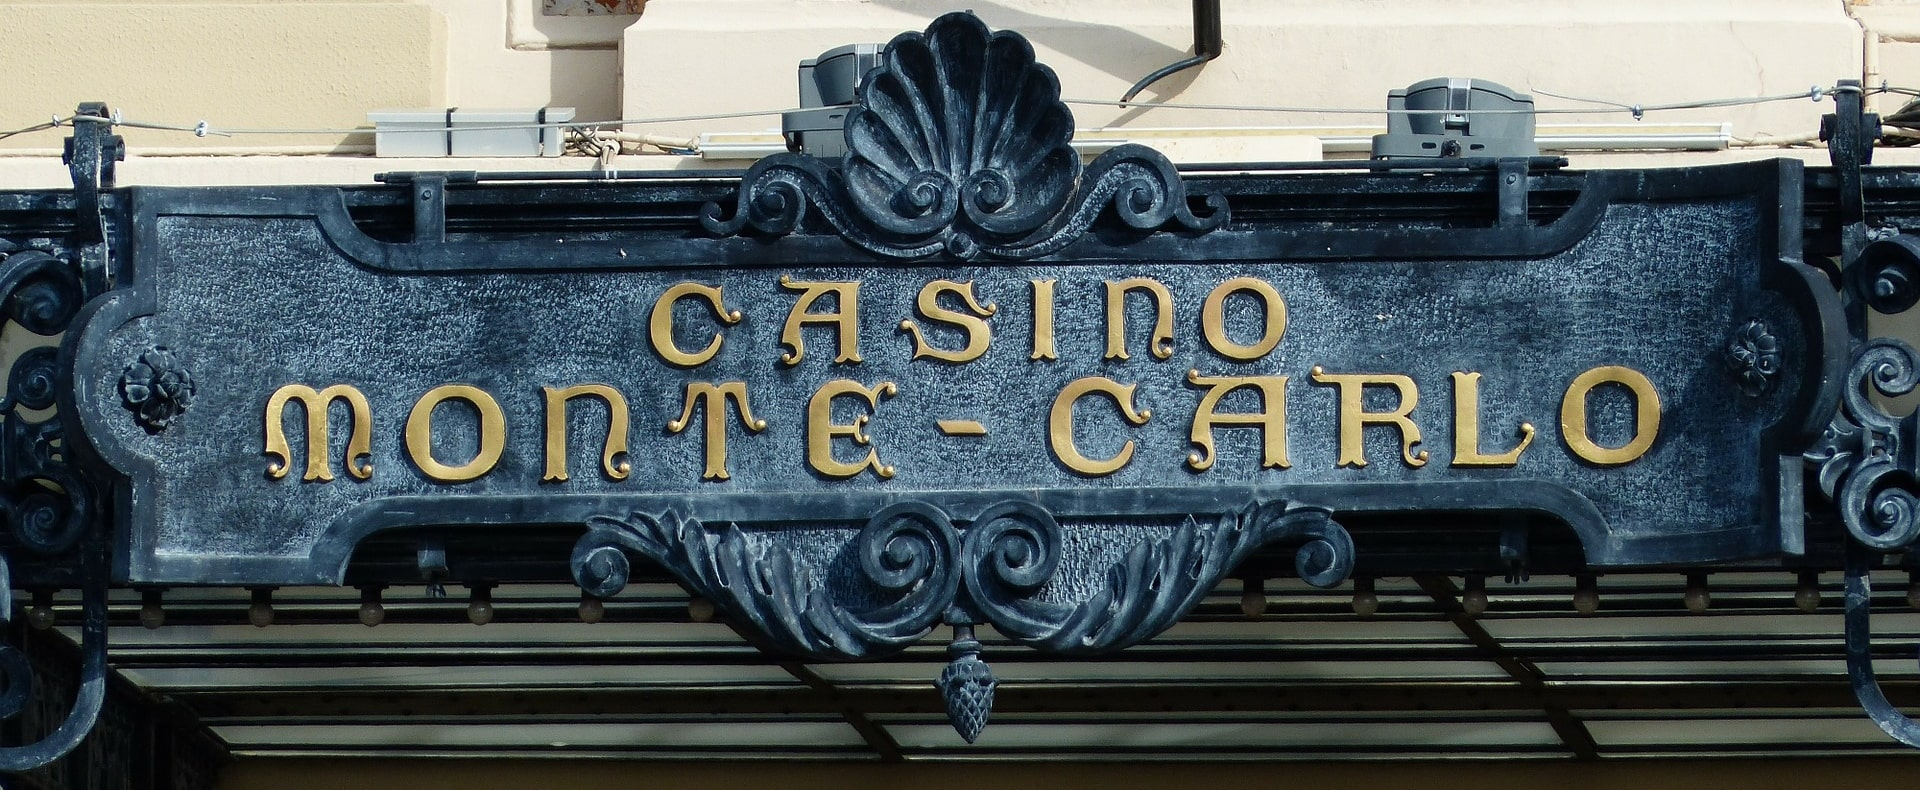 Monte Carlo Casino Experience Gallery